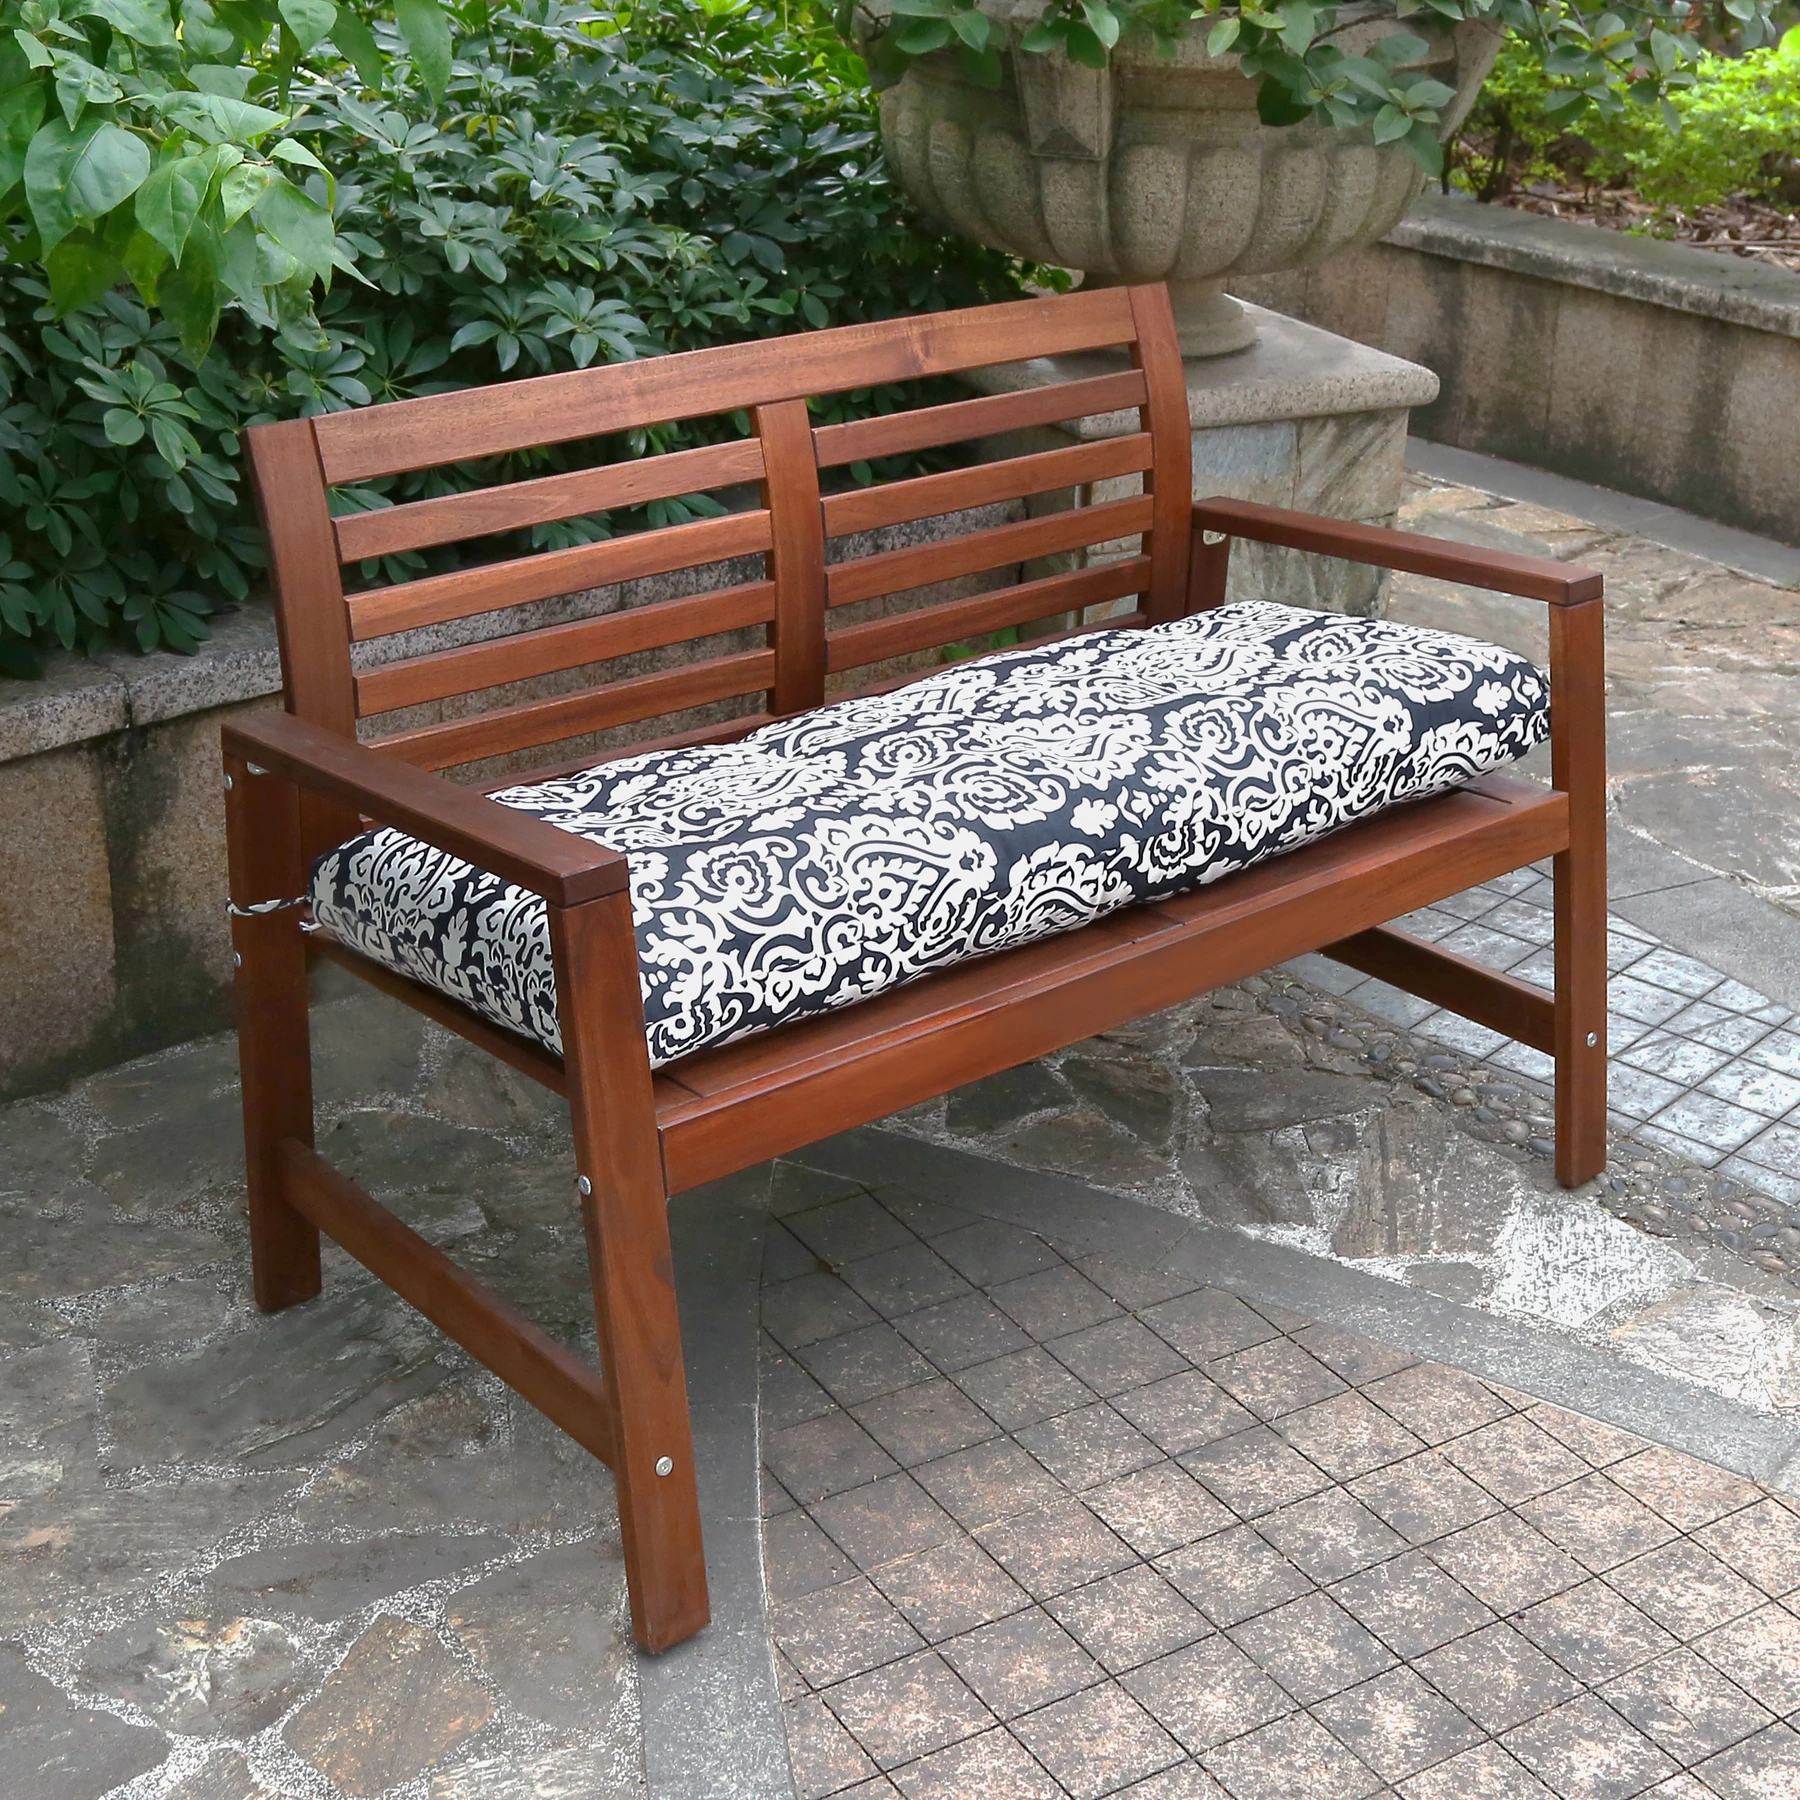 lnc outdoor chair cushion patio bench